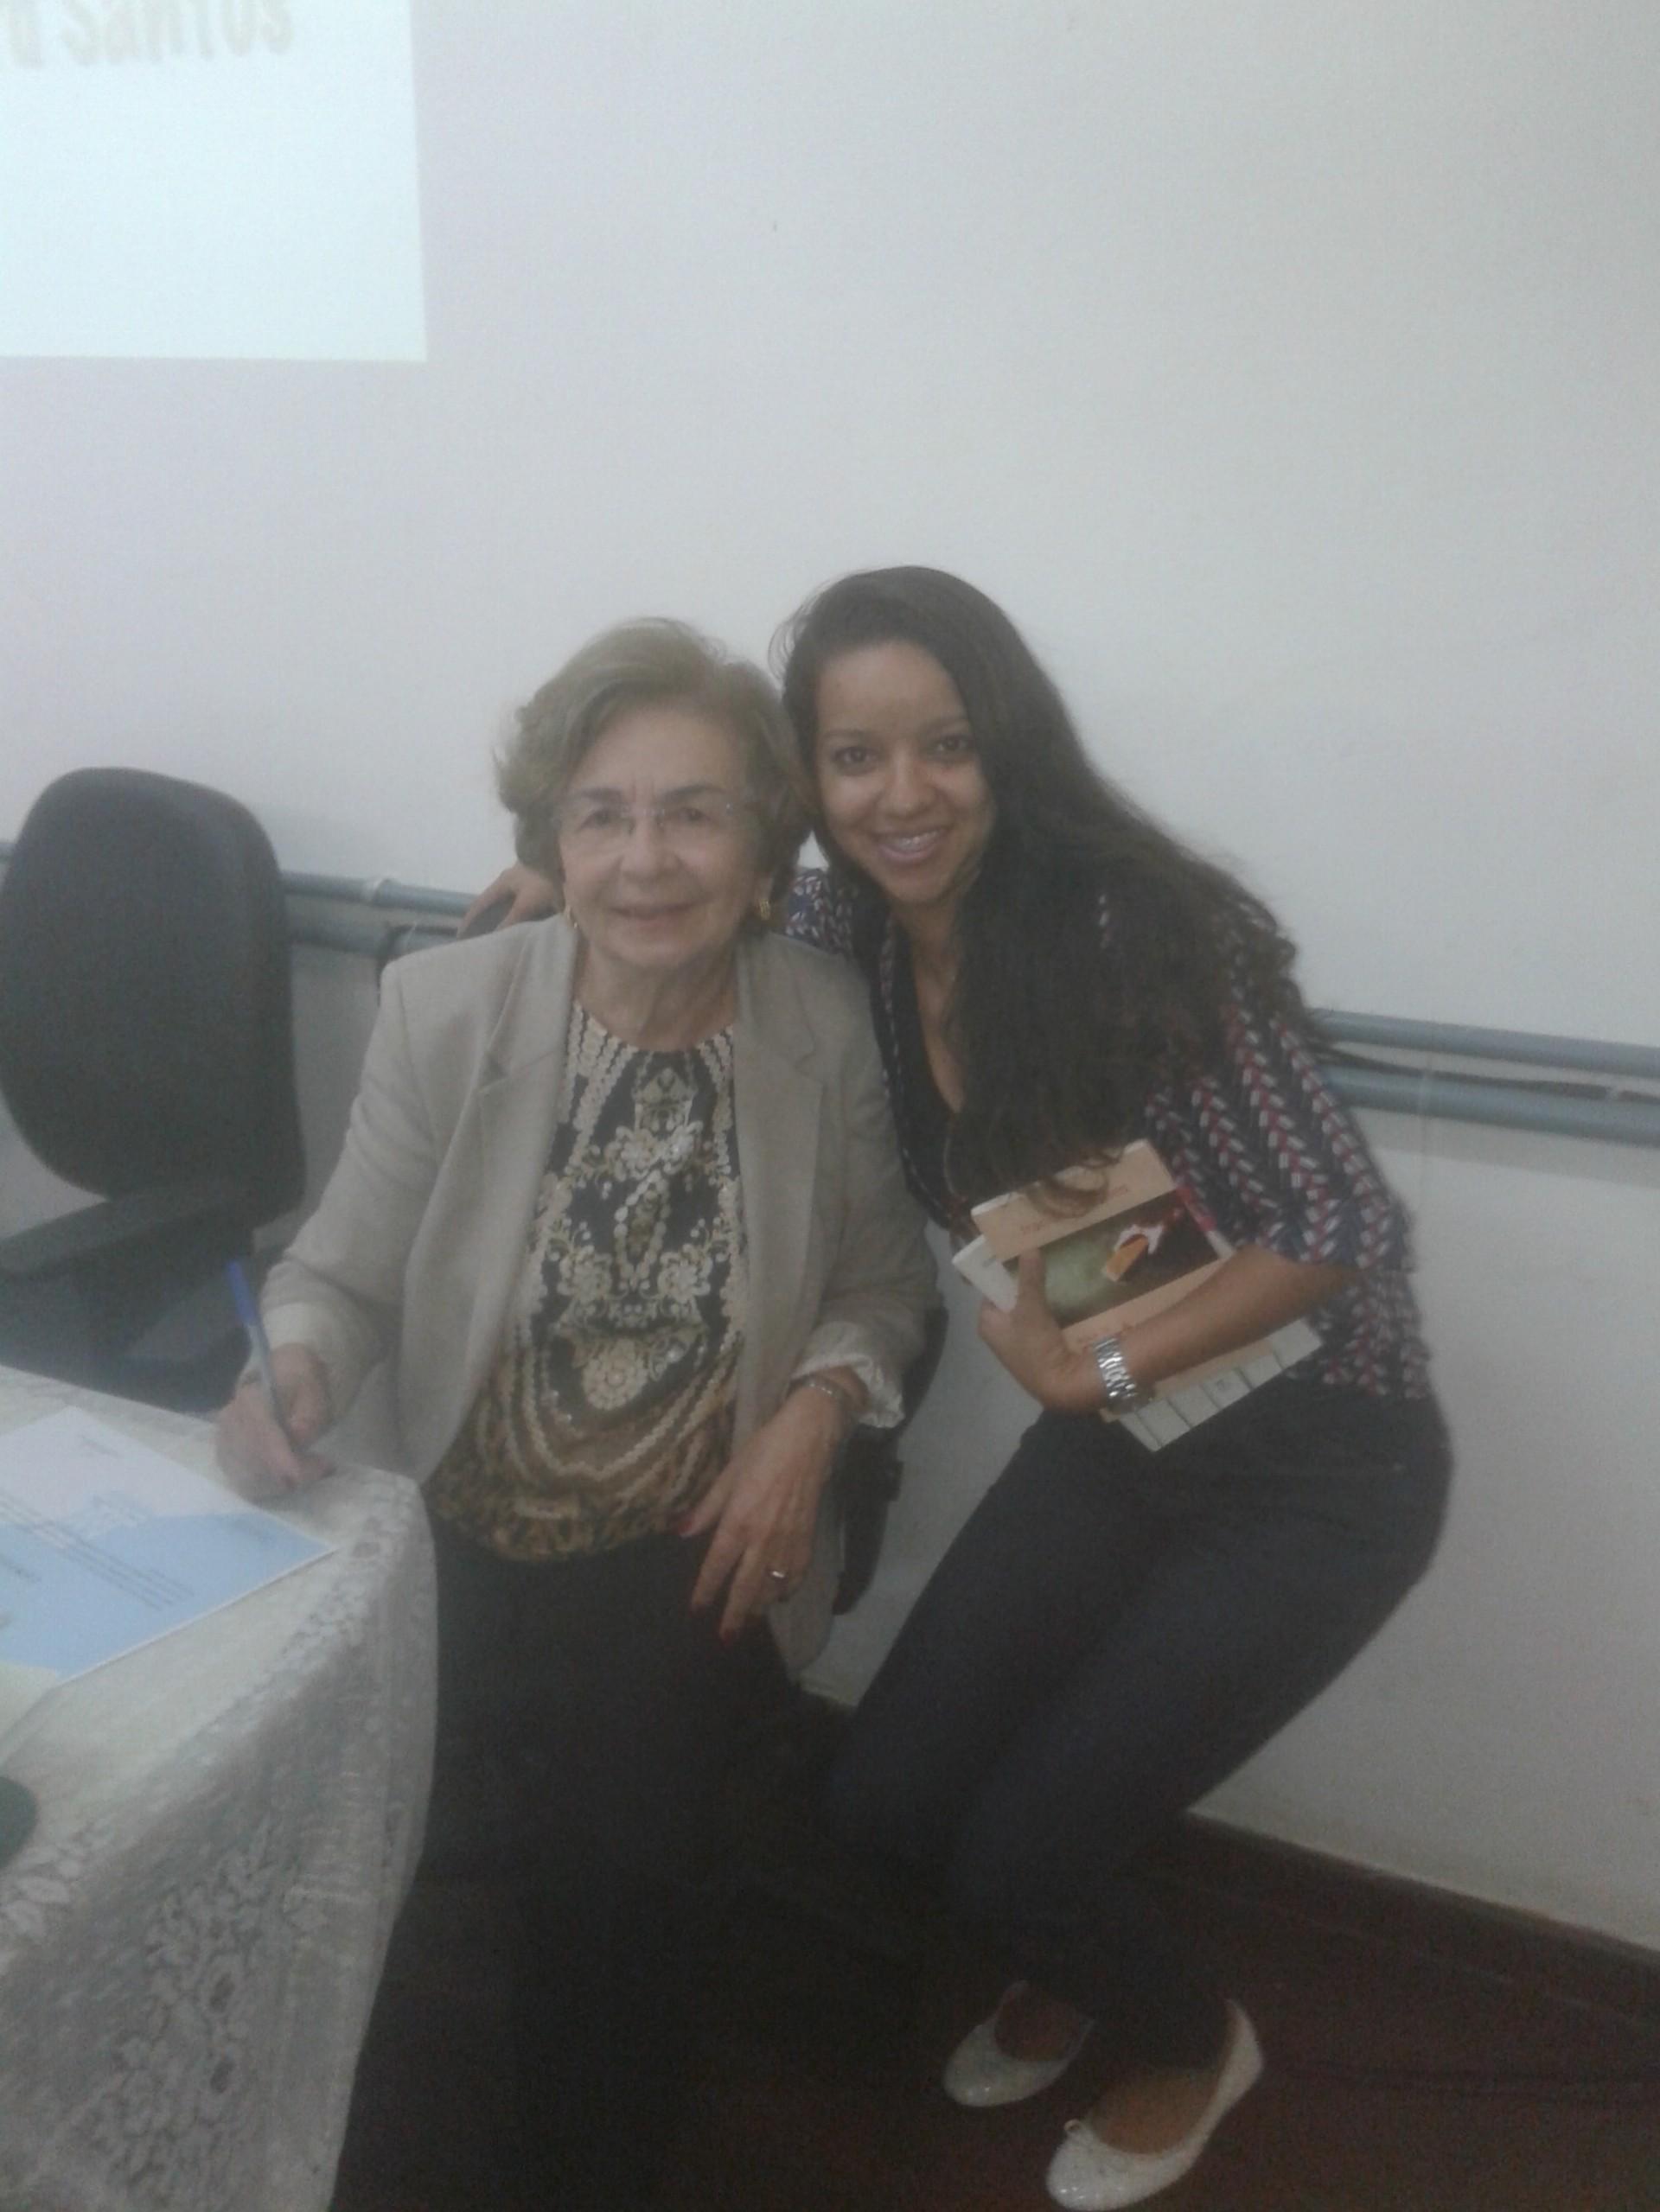 leitura_escrita_irande_antunes_professora_sara_oliveira_falando_portugues